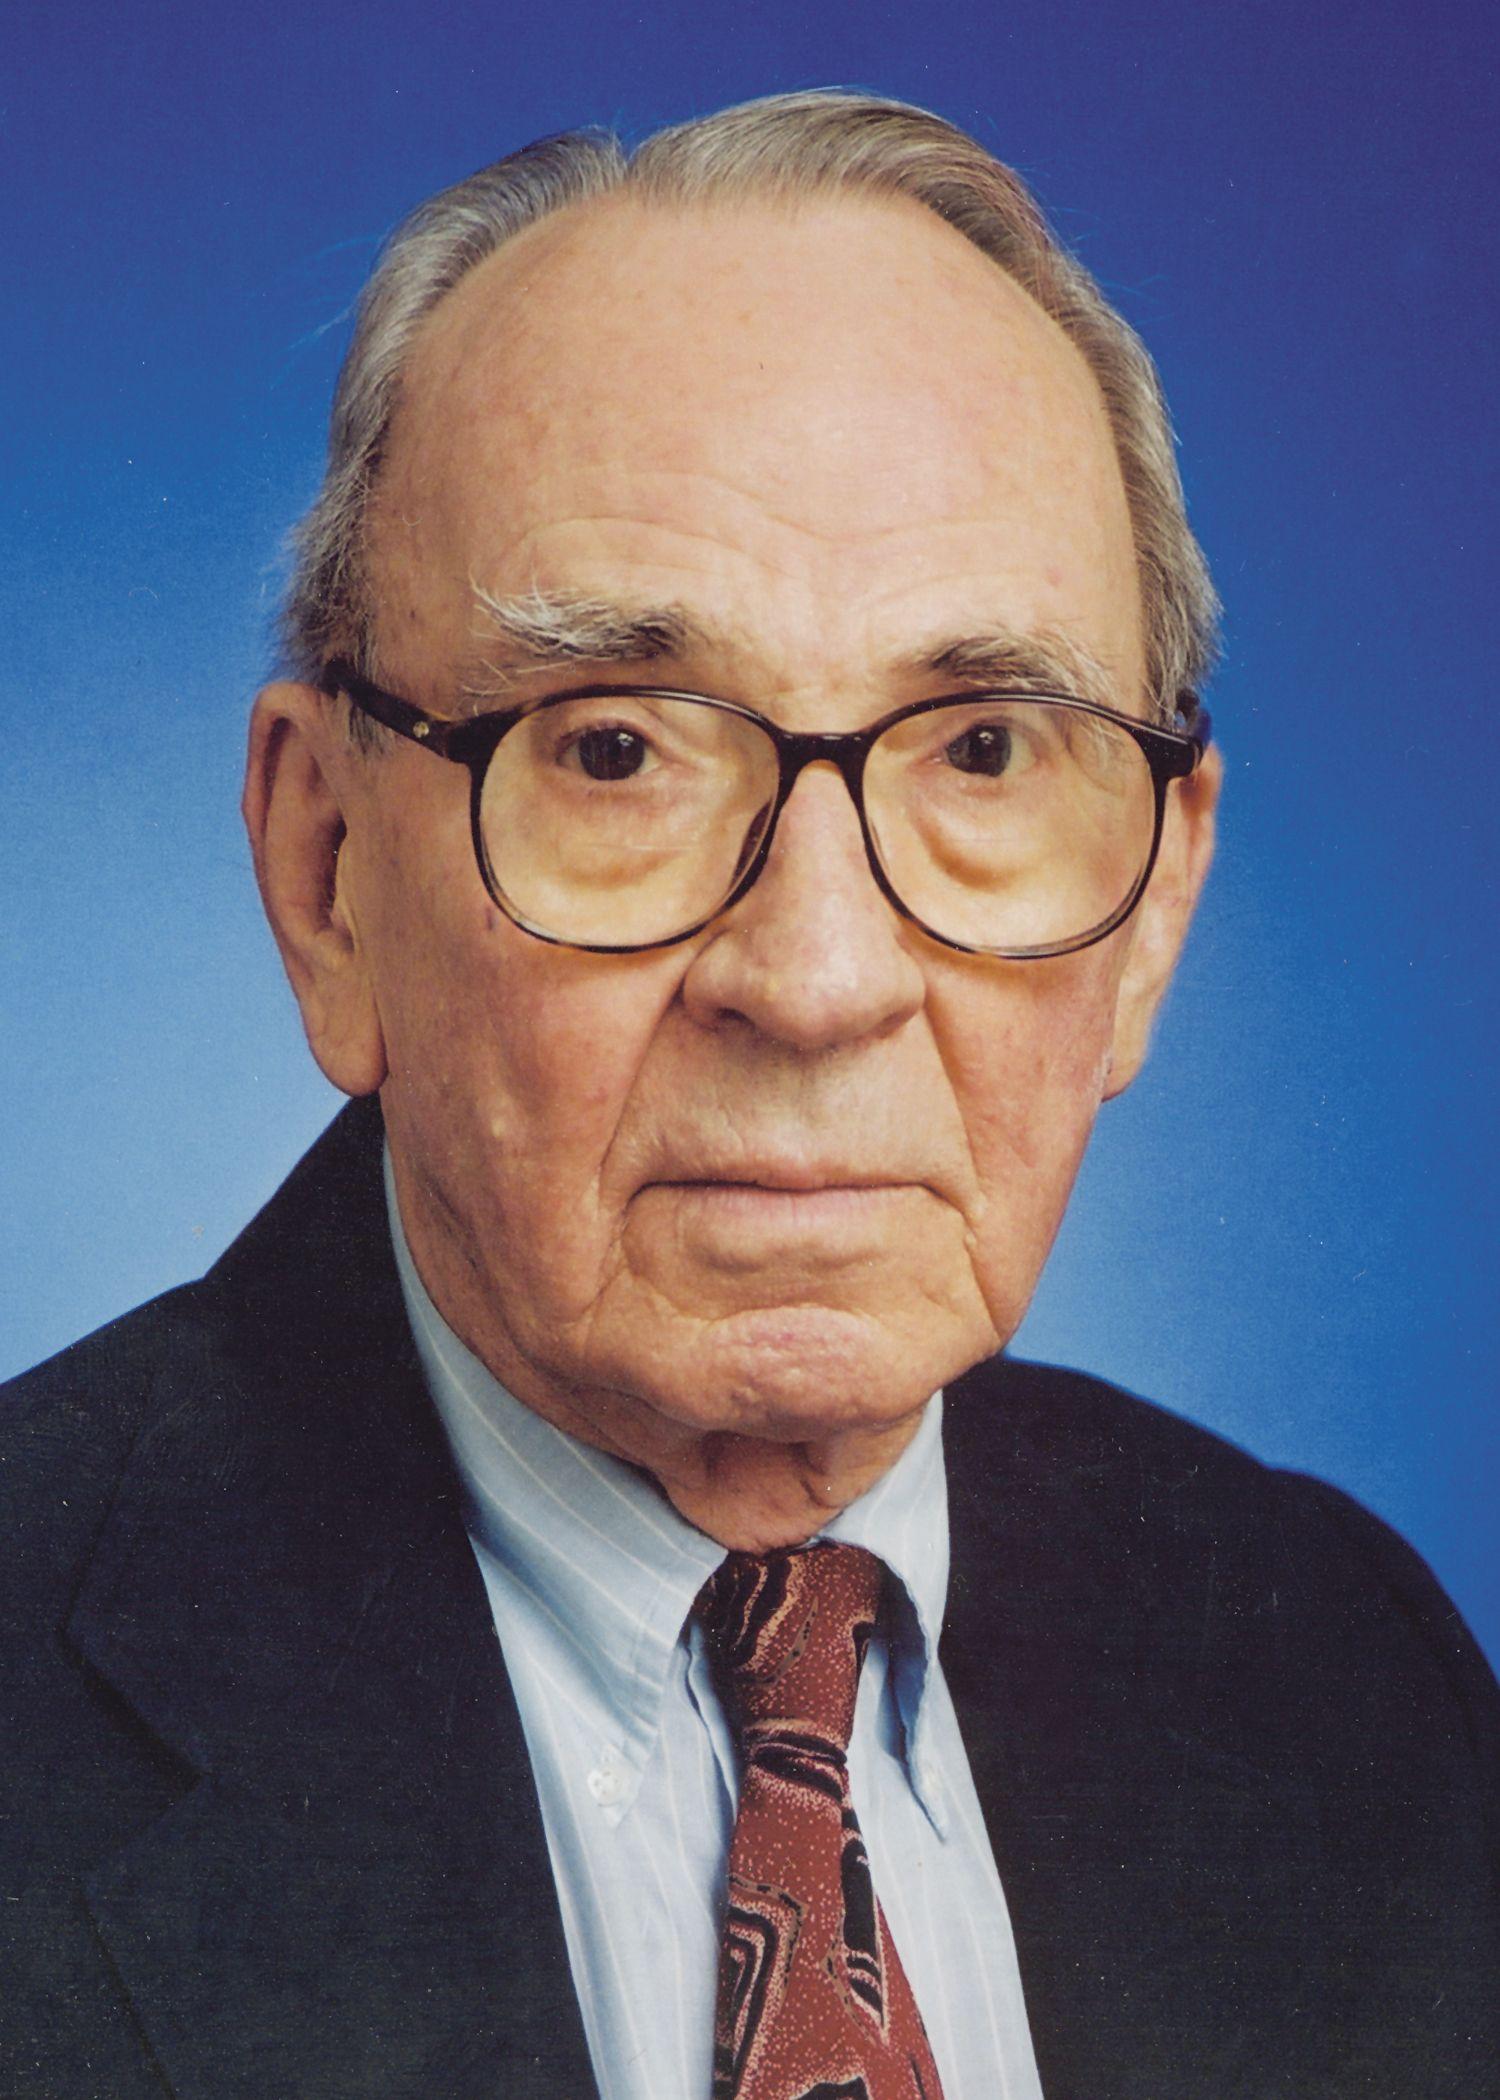 Walter Berns